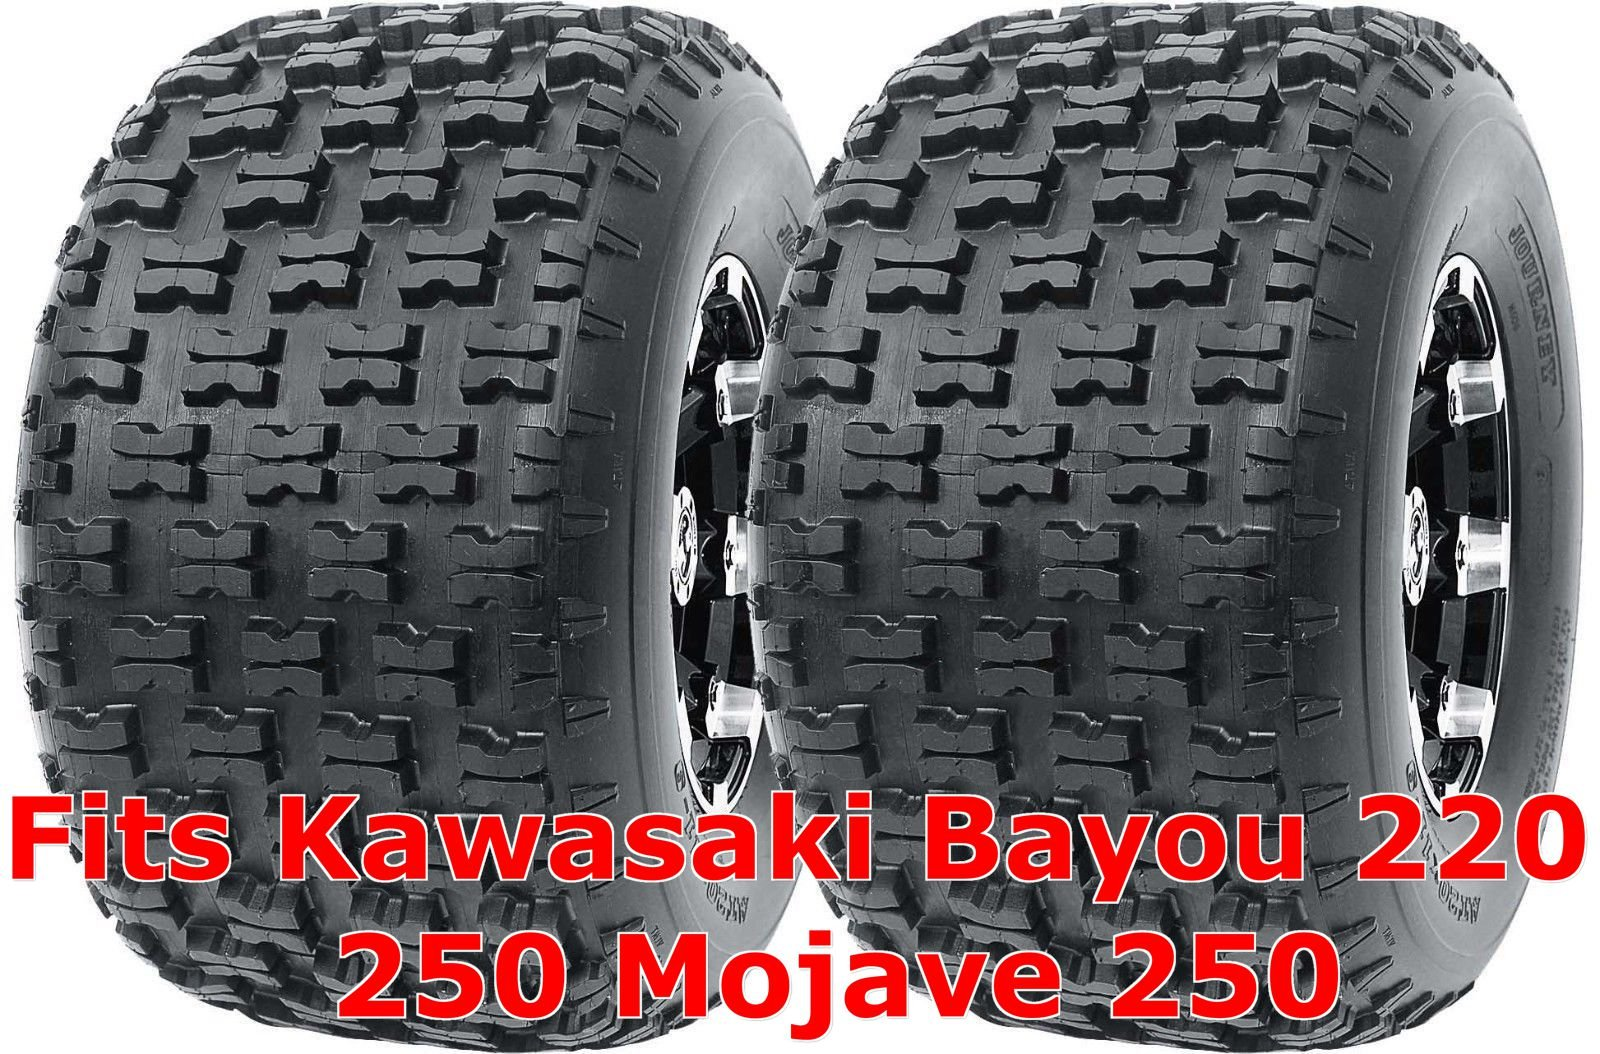 Set 2 WANDA Sport ATV Tires 22x10-10 Kawasaki Bayou 220 250 Mojave 250 Rear P336